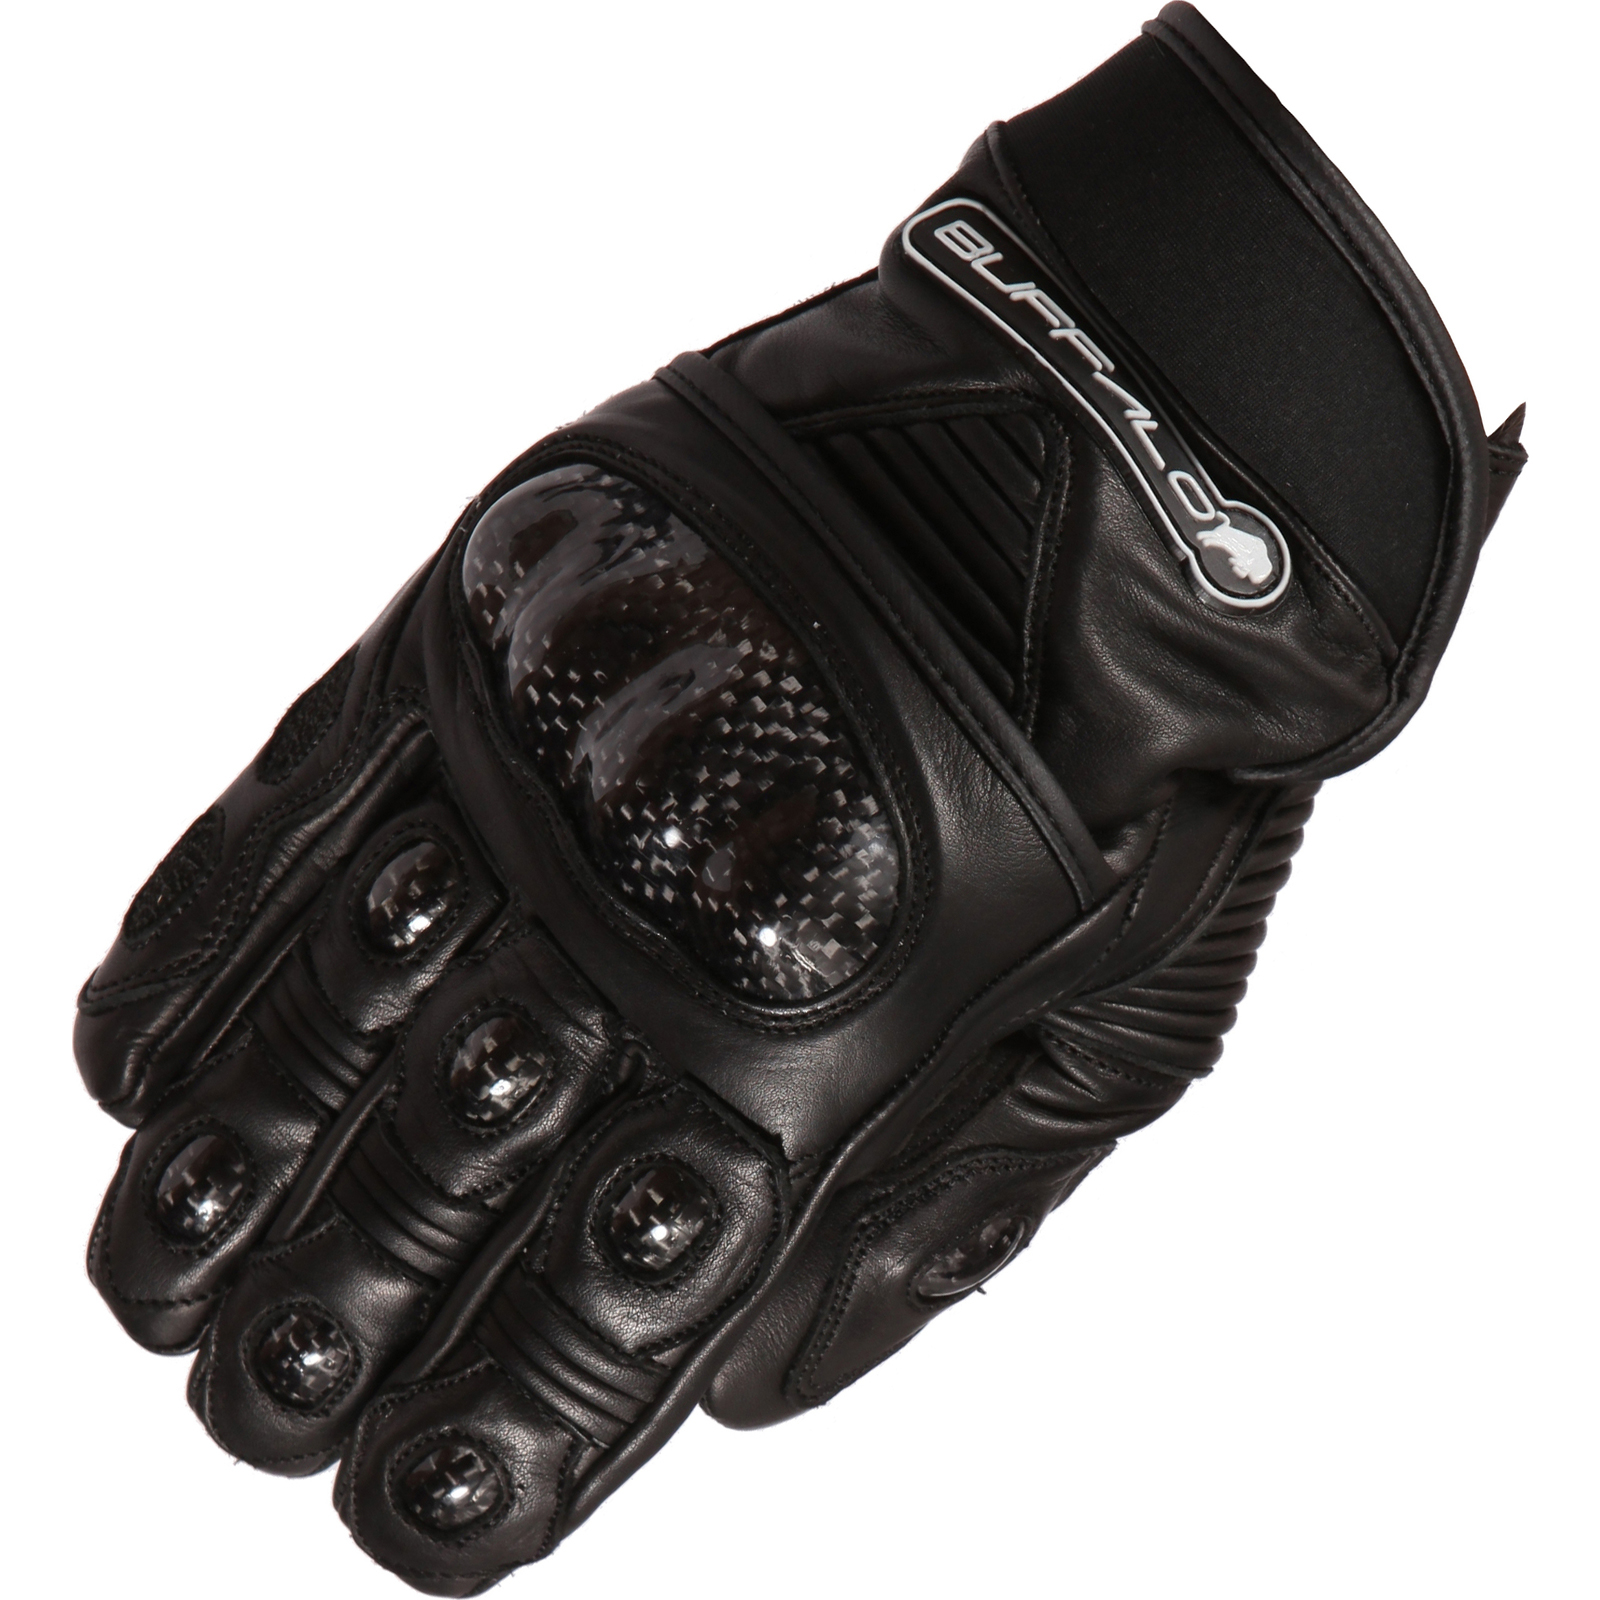 Buffalo corto motorcycle gloves short bike street urban leather hard knuckle